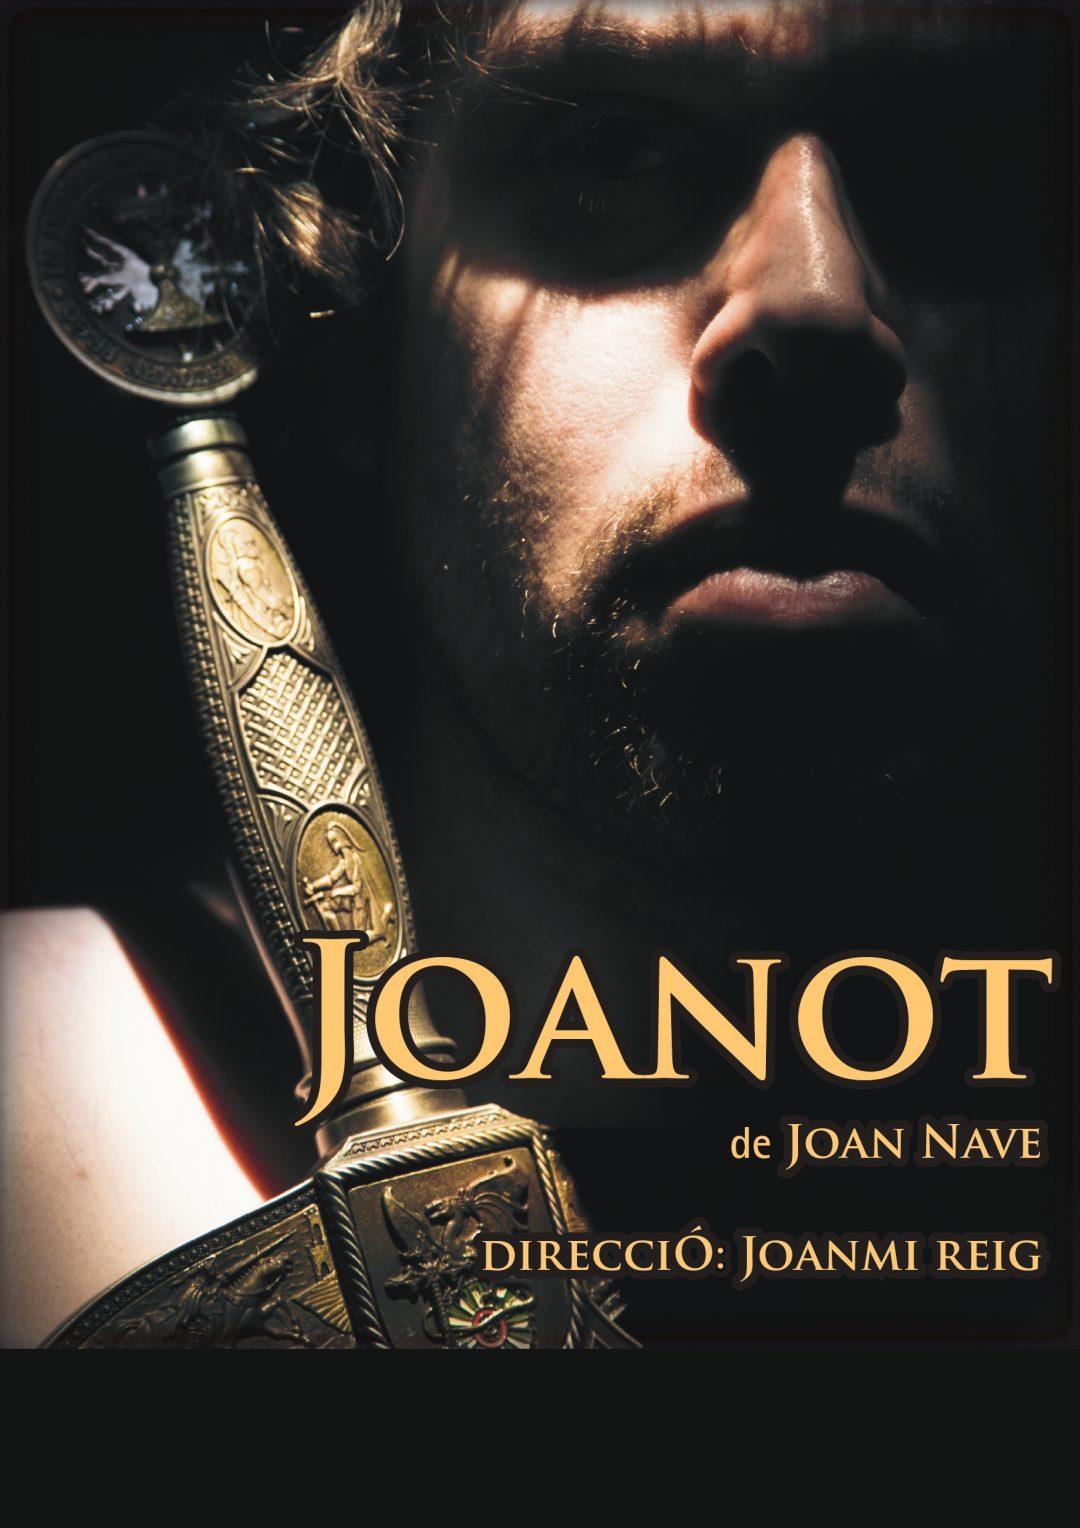 JOANOT